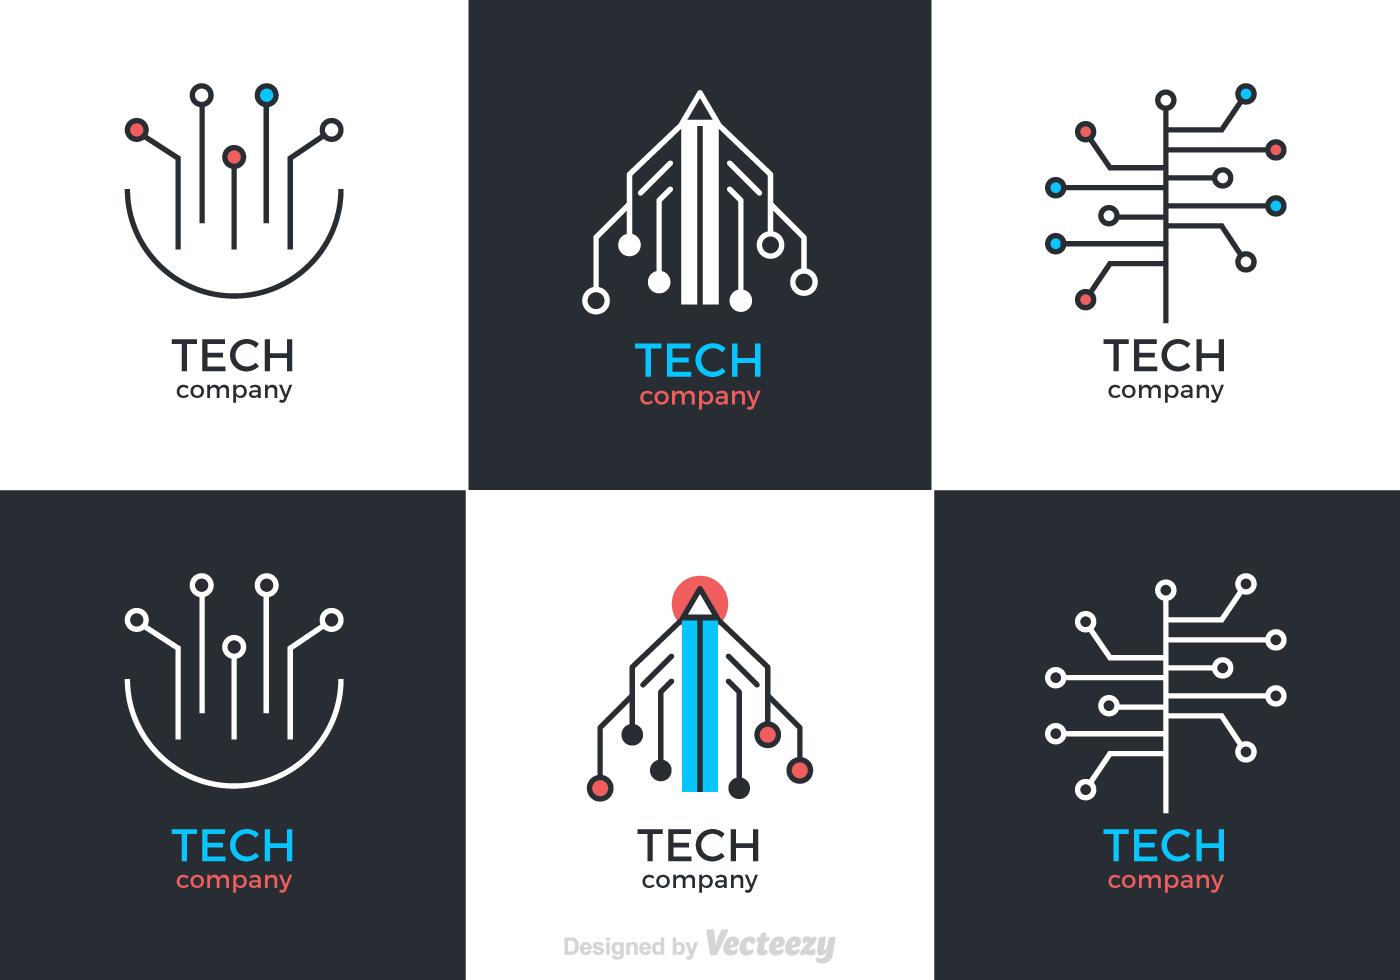 Technology Vector Symbols - Download Free Vector Art, Stock Graphics ...